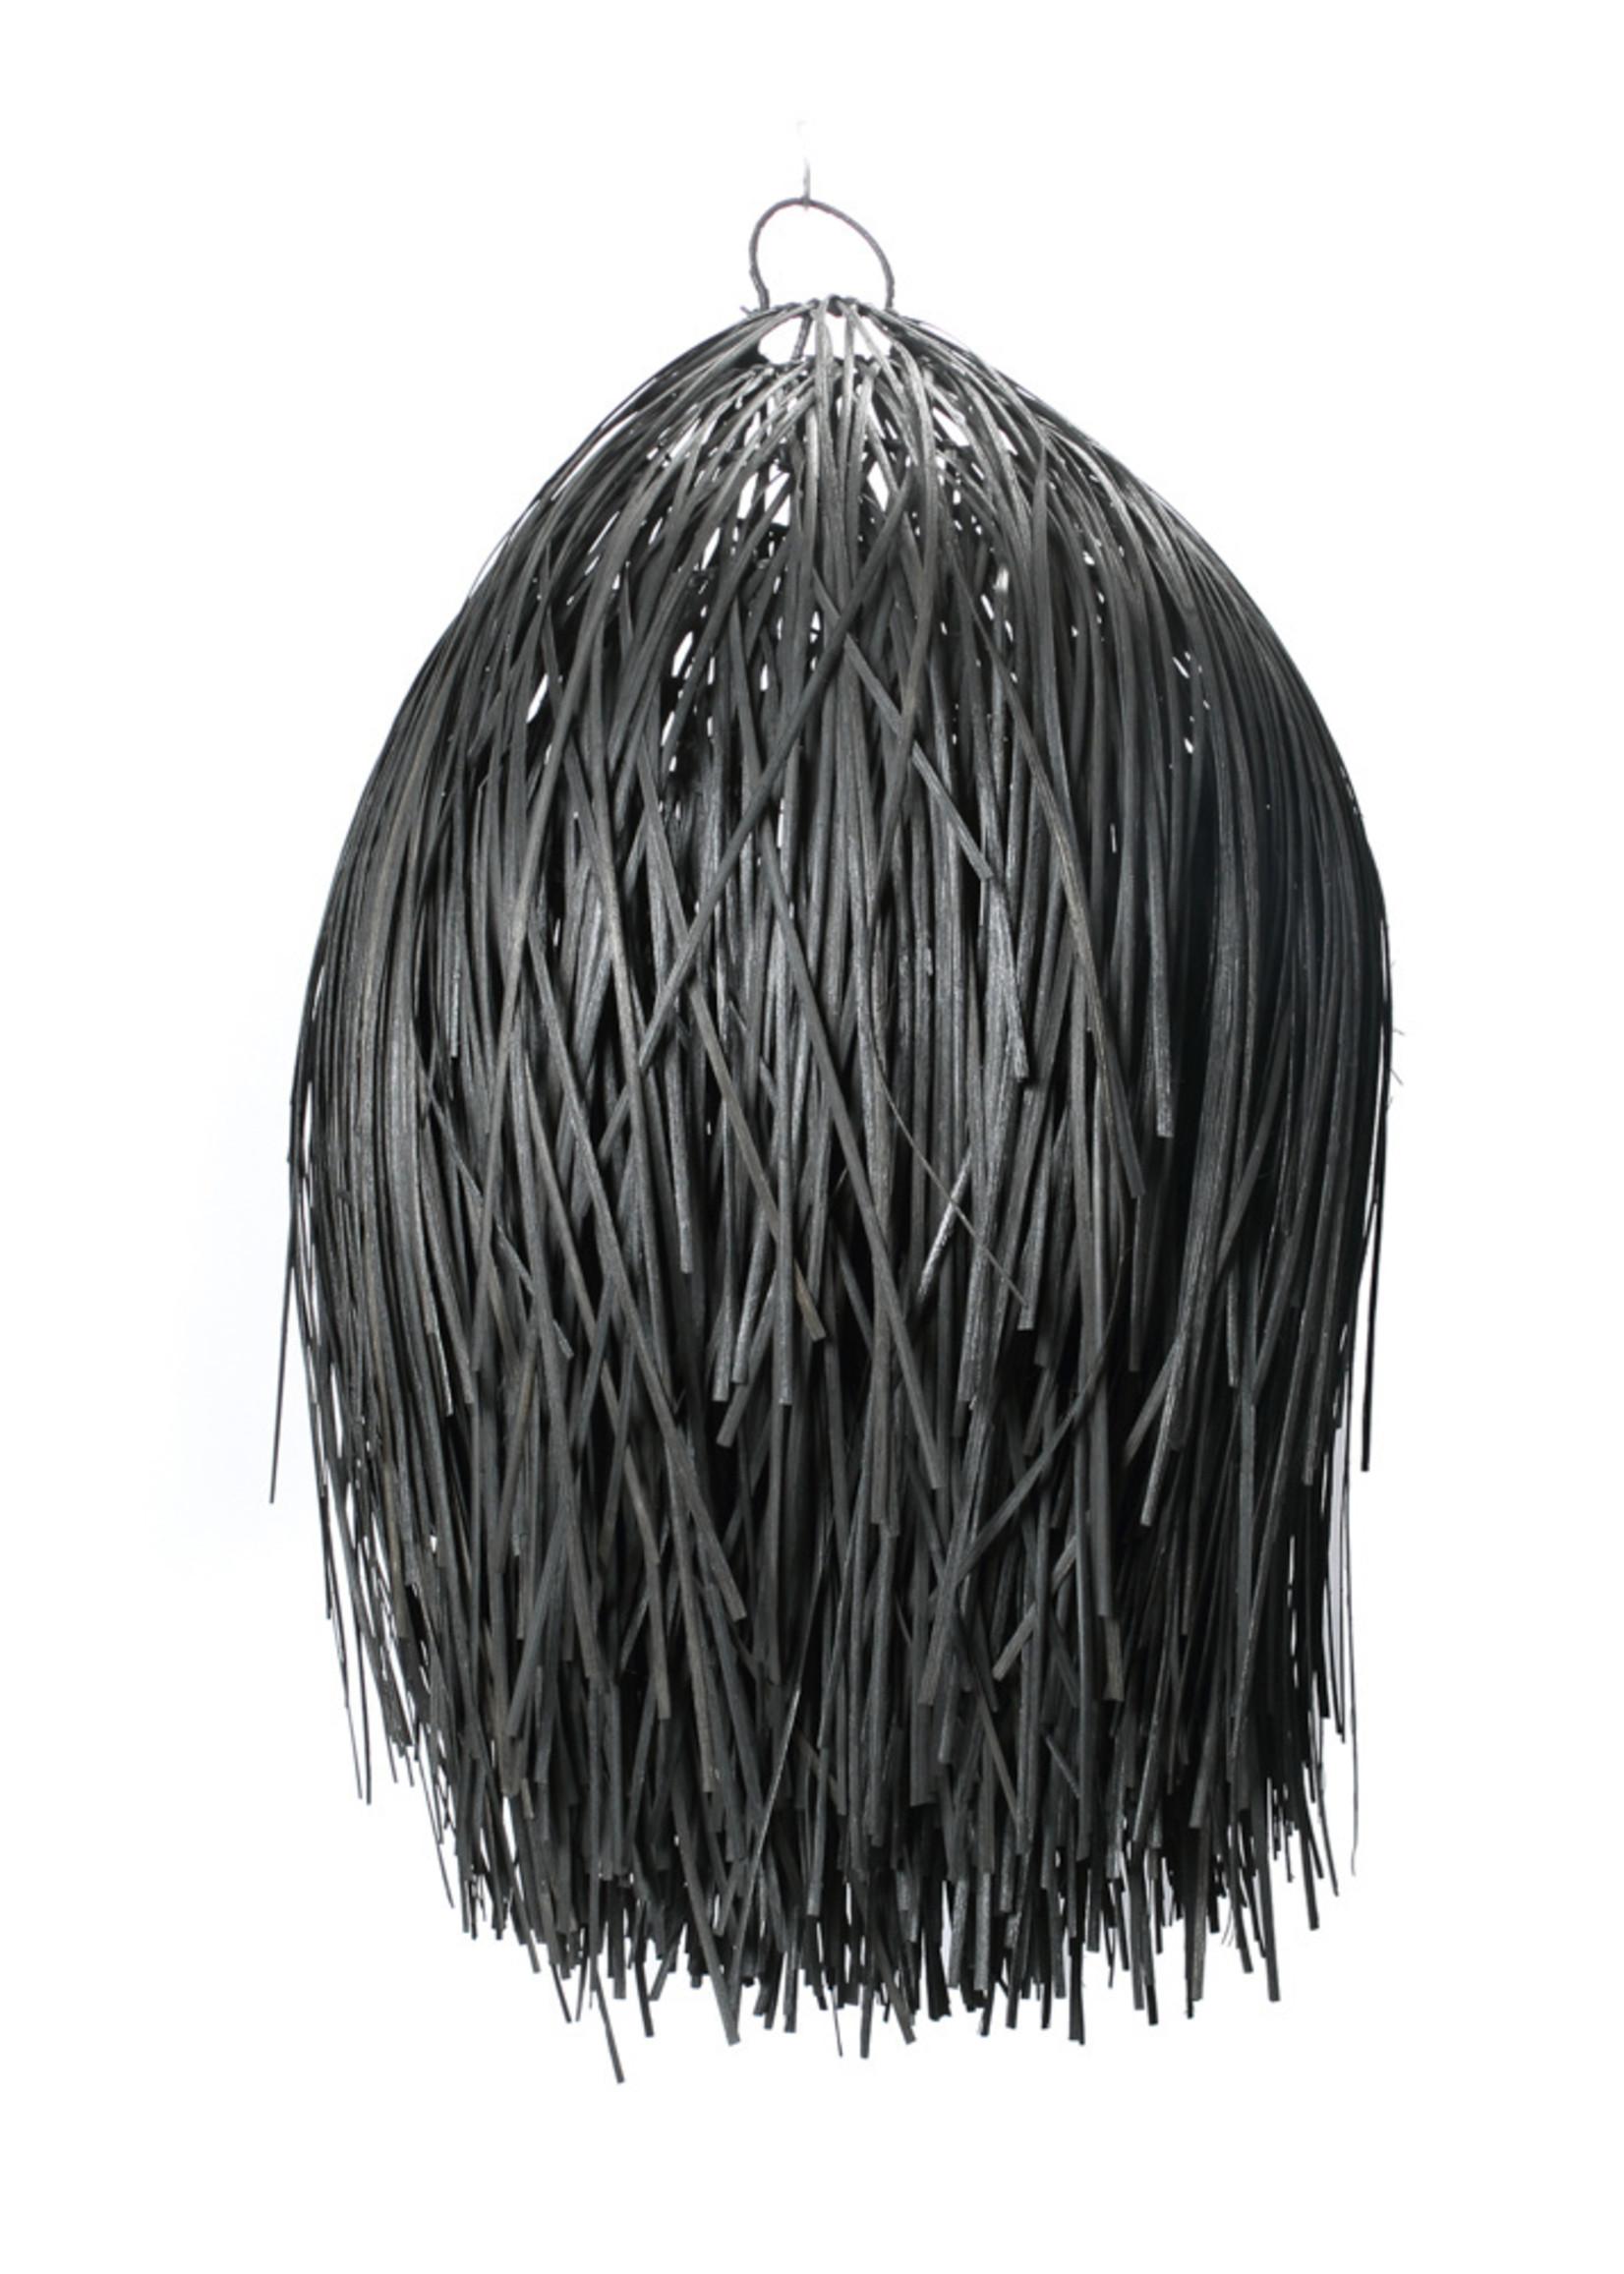 The Rattan Shaggy Pendant - Black - M